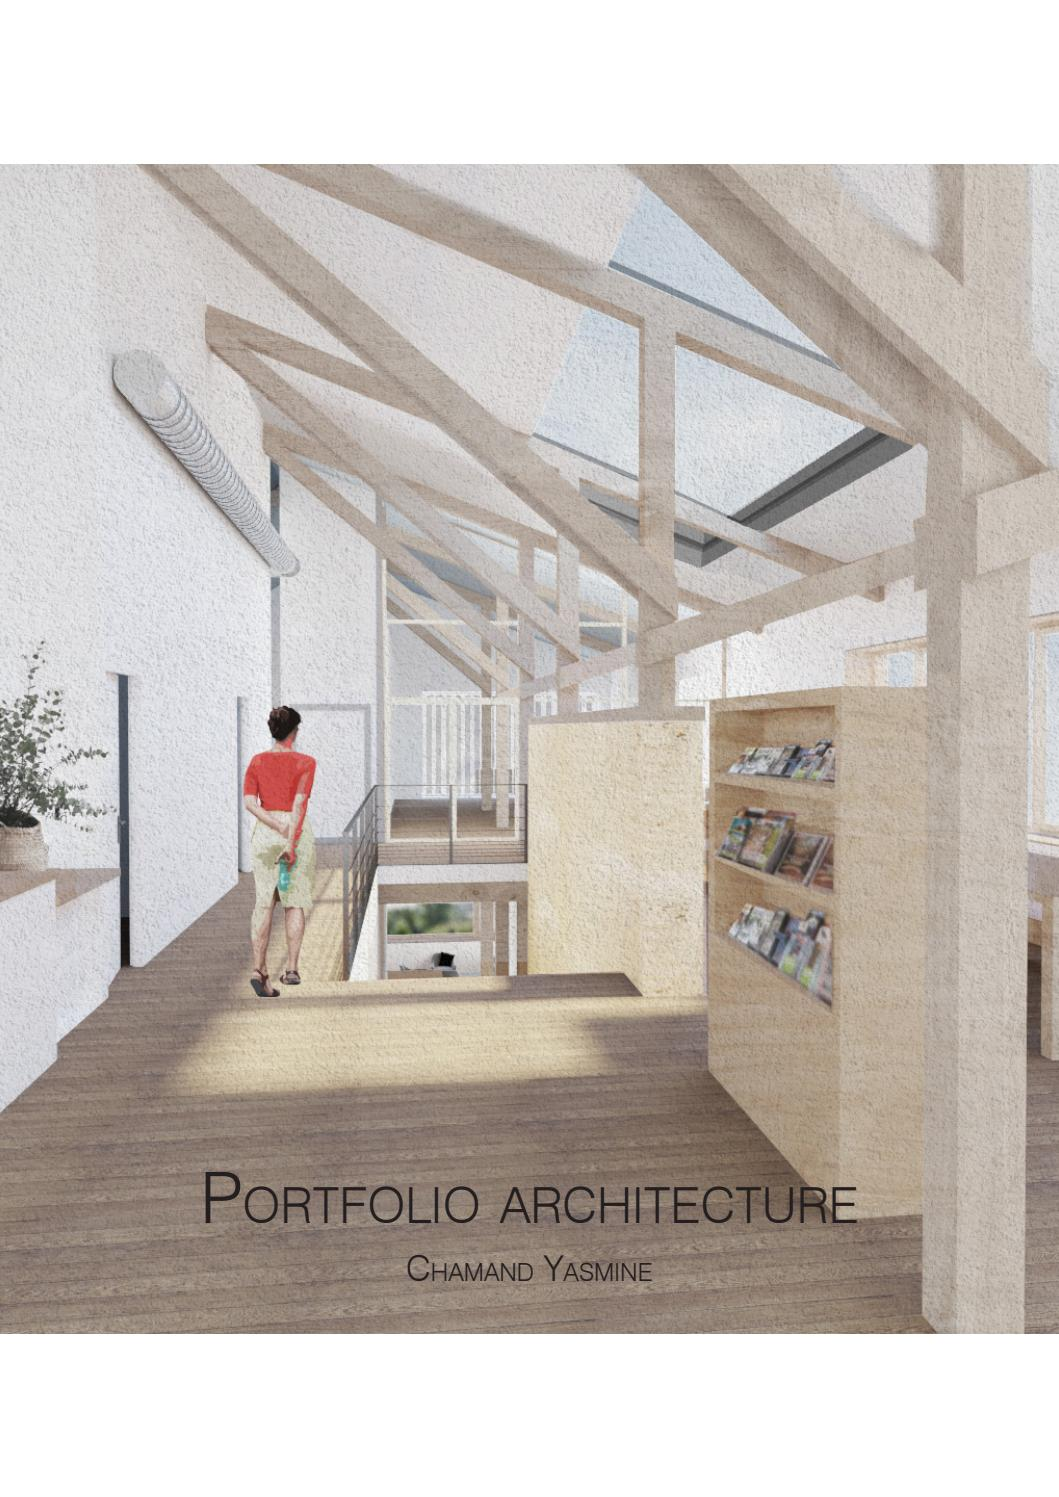 portfolio d u0026 39 architecture - chamand yasmine